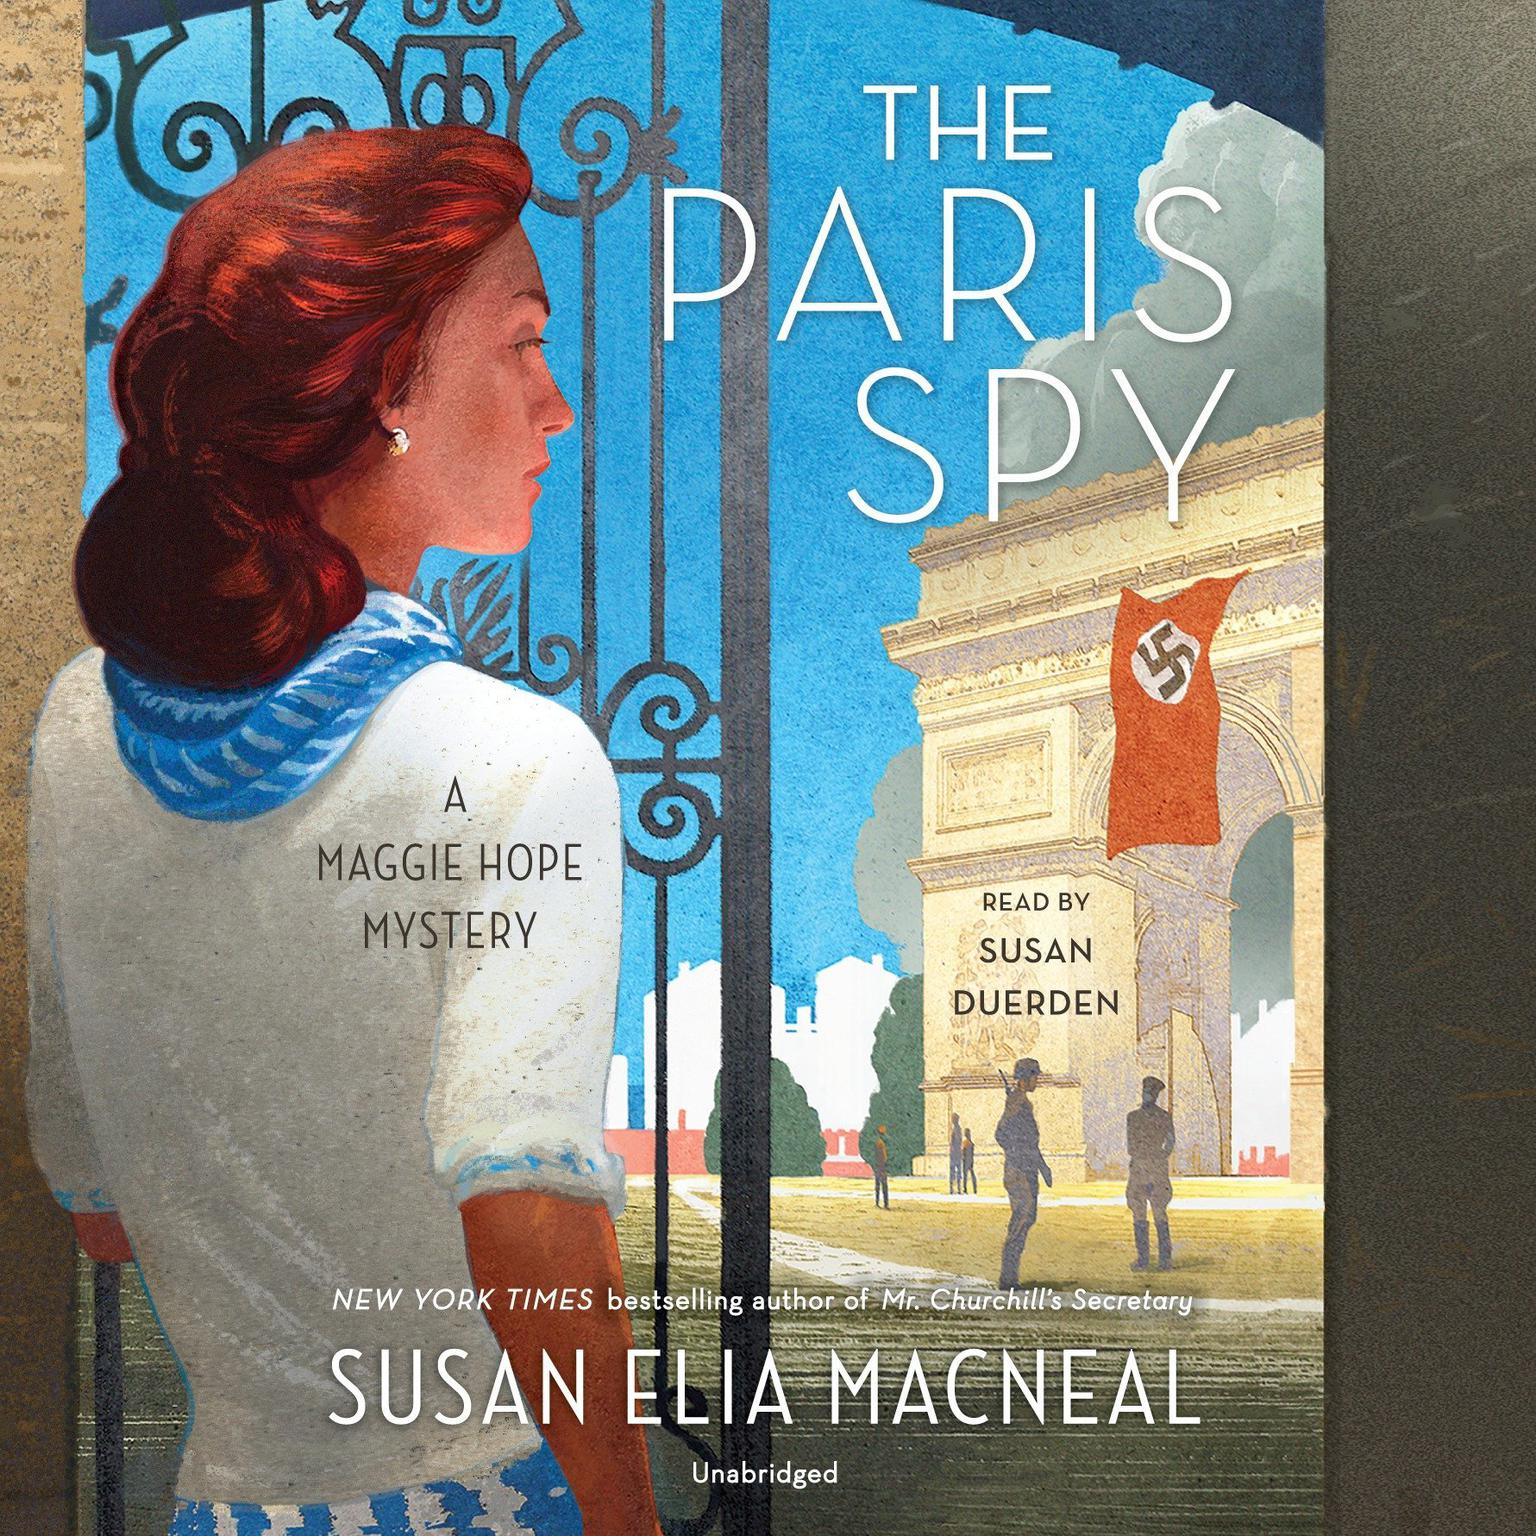 The Paris Spy: A Maggie Hope Mystery Audiobook, by Susan Elia MacNeal